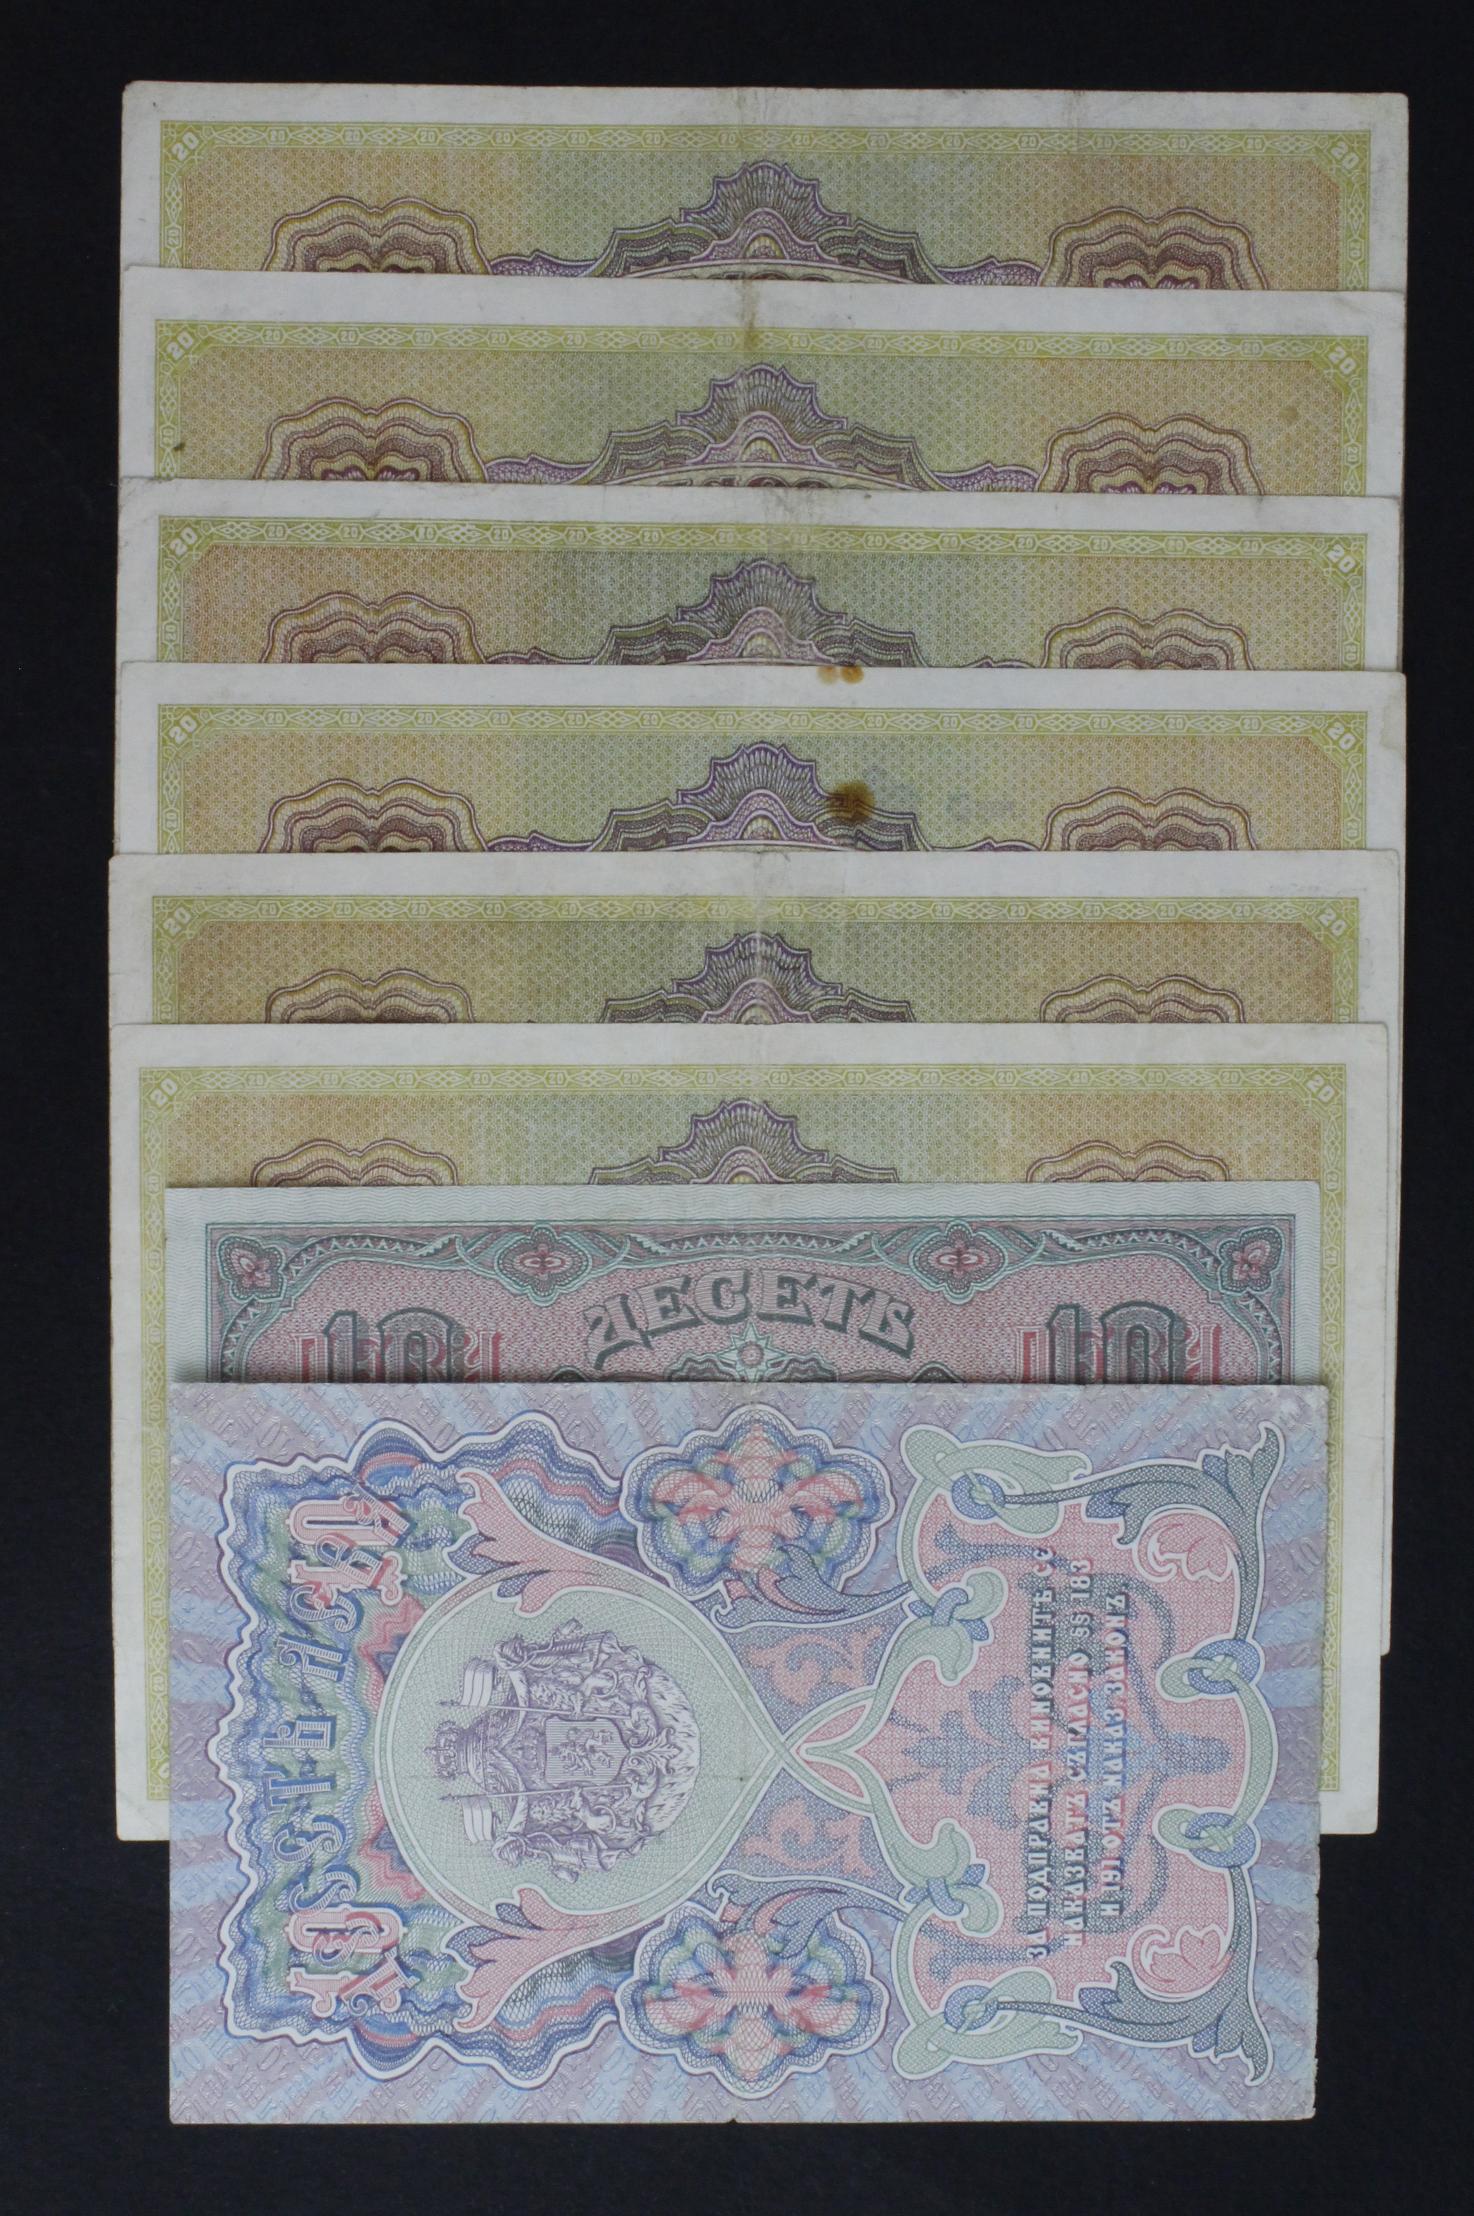 Bulgaria (8), 20 Leva Zlatni (6) issued 1917 (TBB B130a, Pick23a), 10 Leva Zlatni issued 1917 (TBB - Image 2 of 2